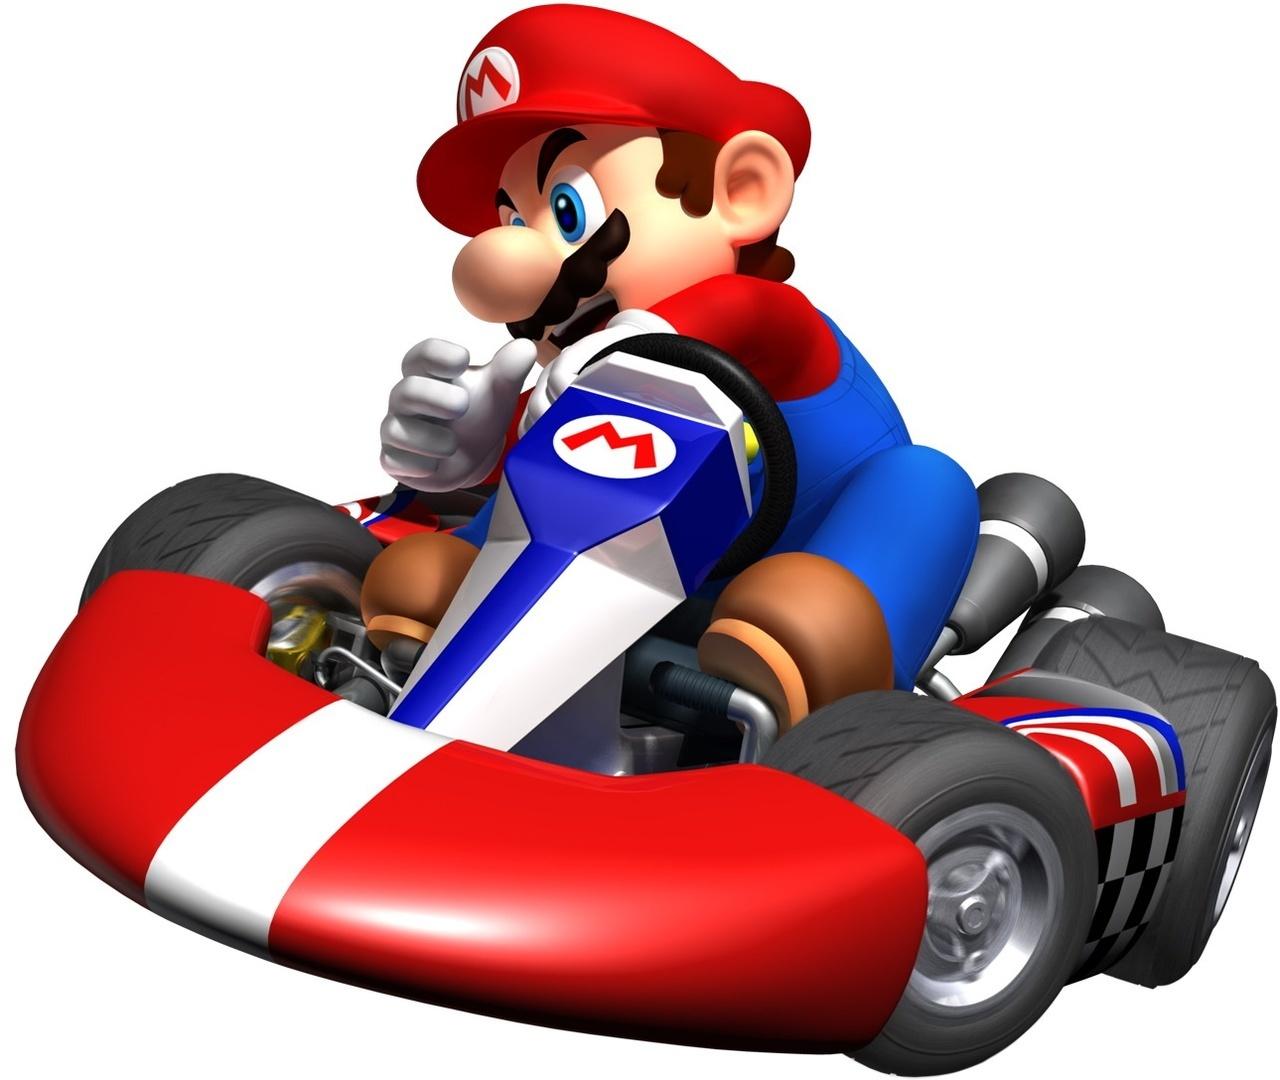 Mario and Luigi images Mario Kart Wii HD wallpaper and background photos - Mario Kart PNG HD